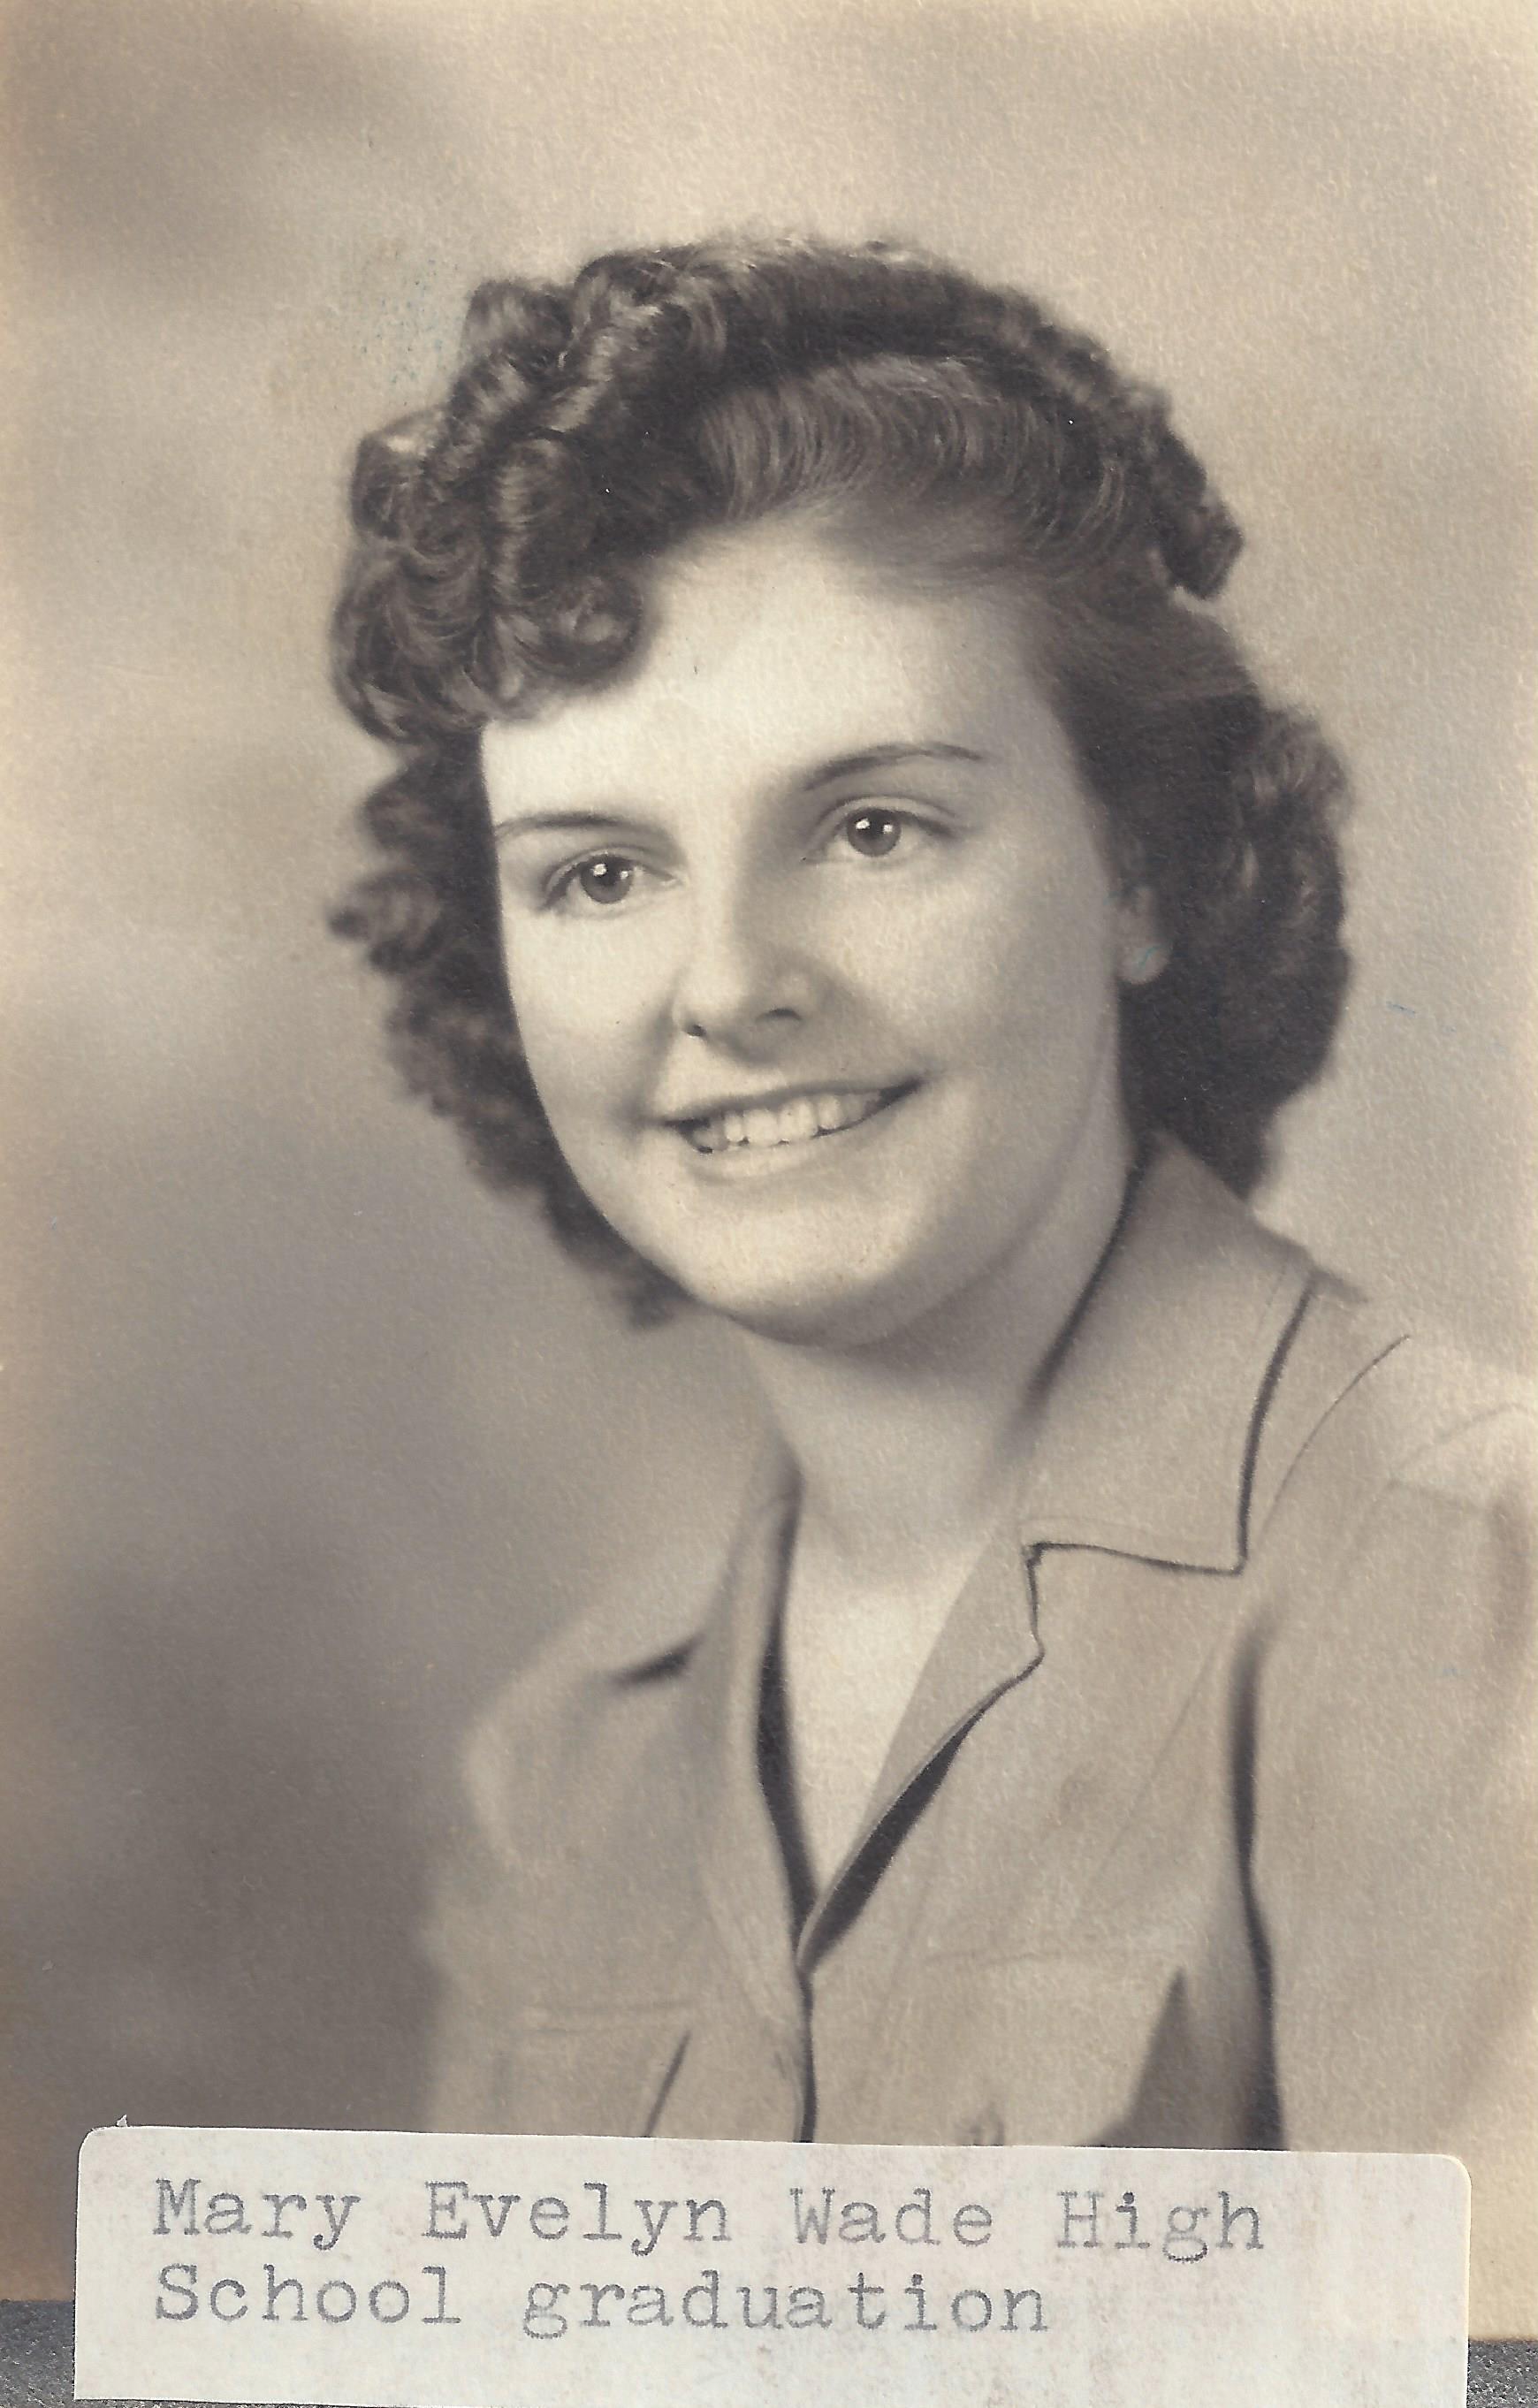 Julia Ann,Kelli Maroney Hot archive Betty Garde,Gloria Foster